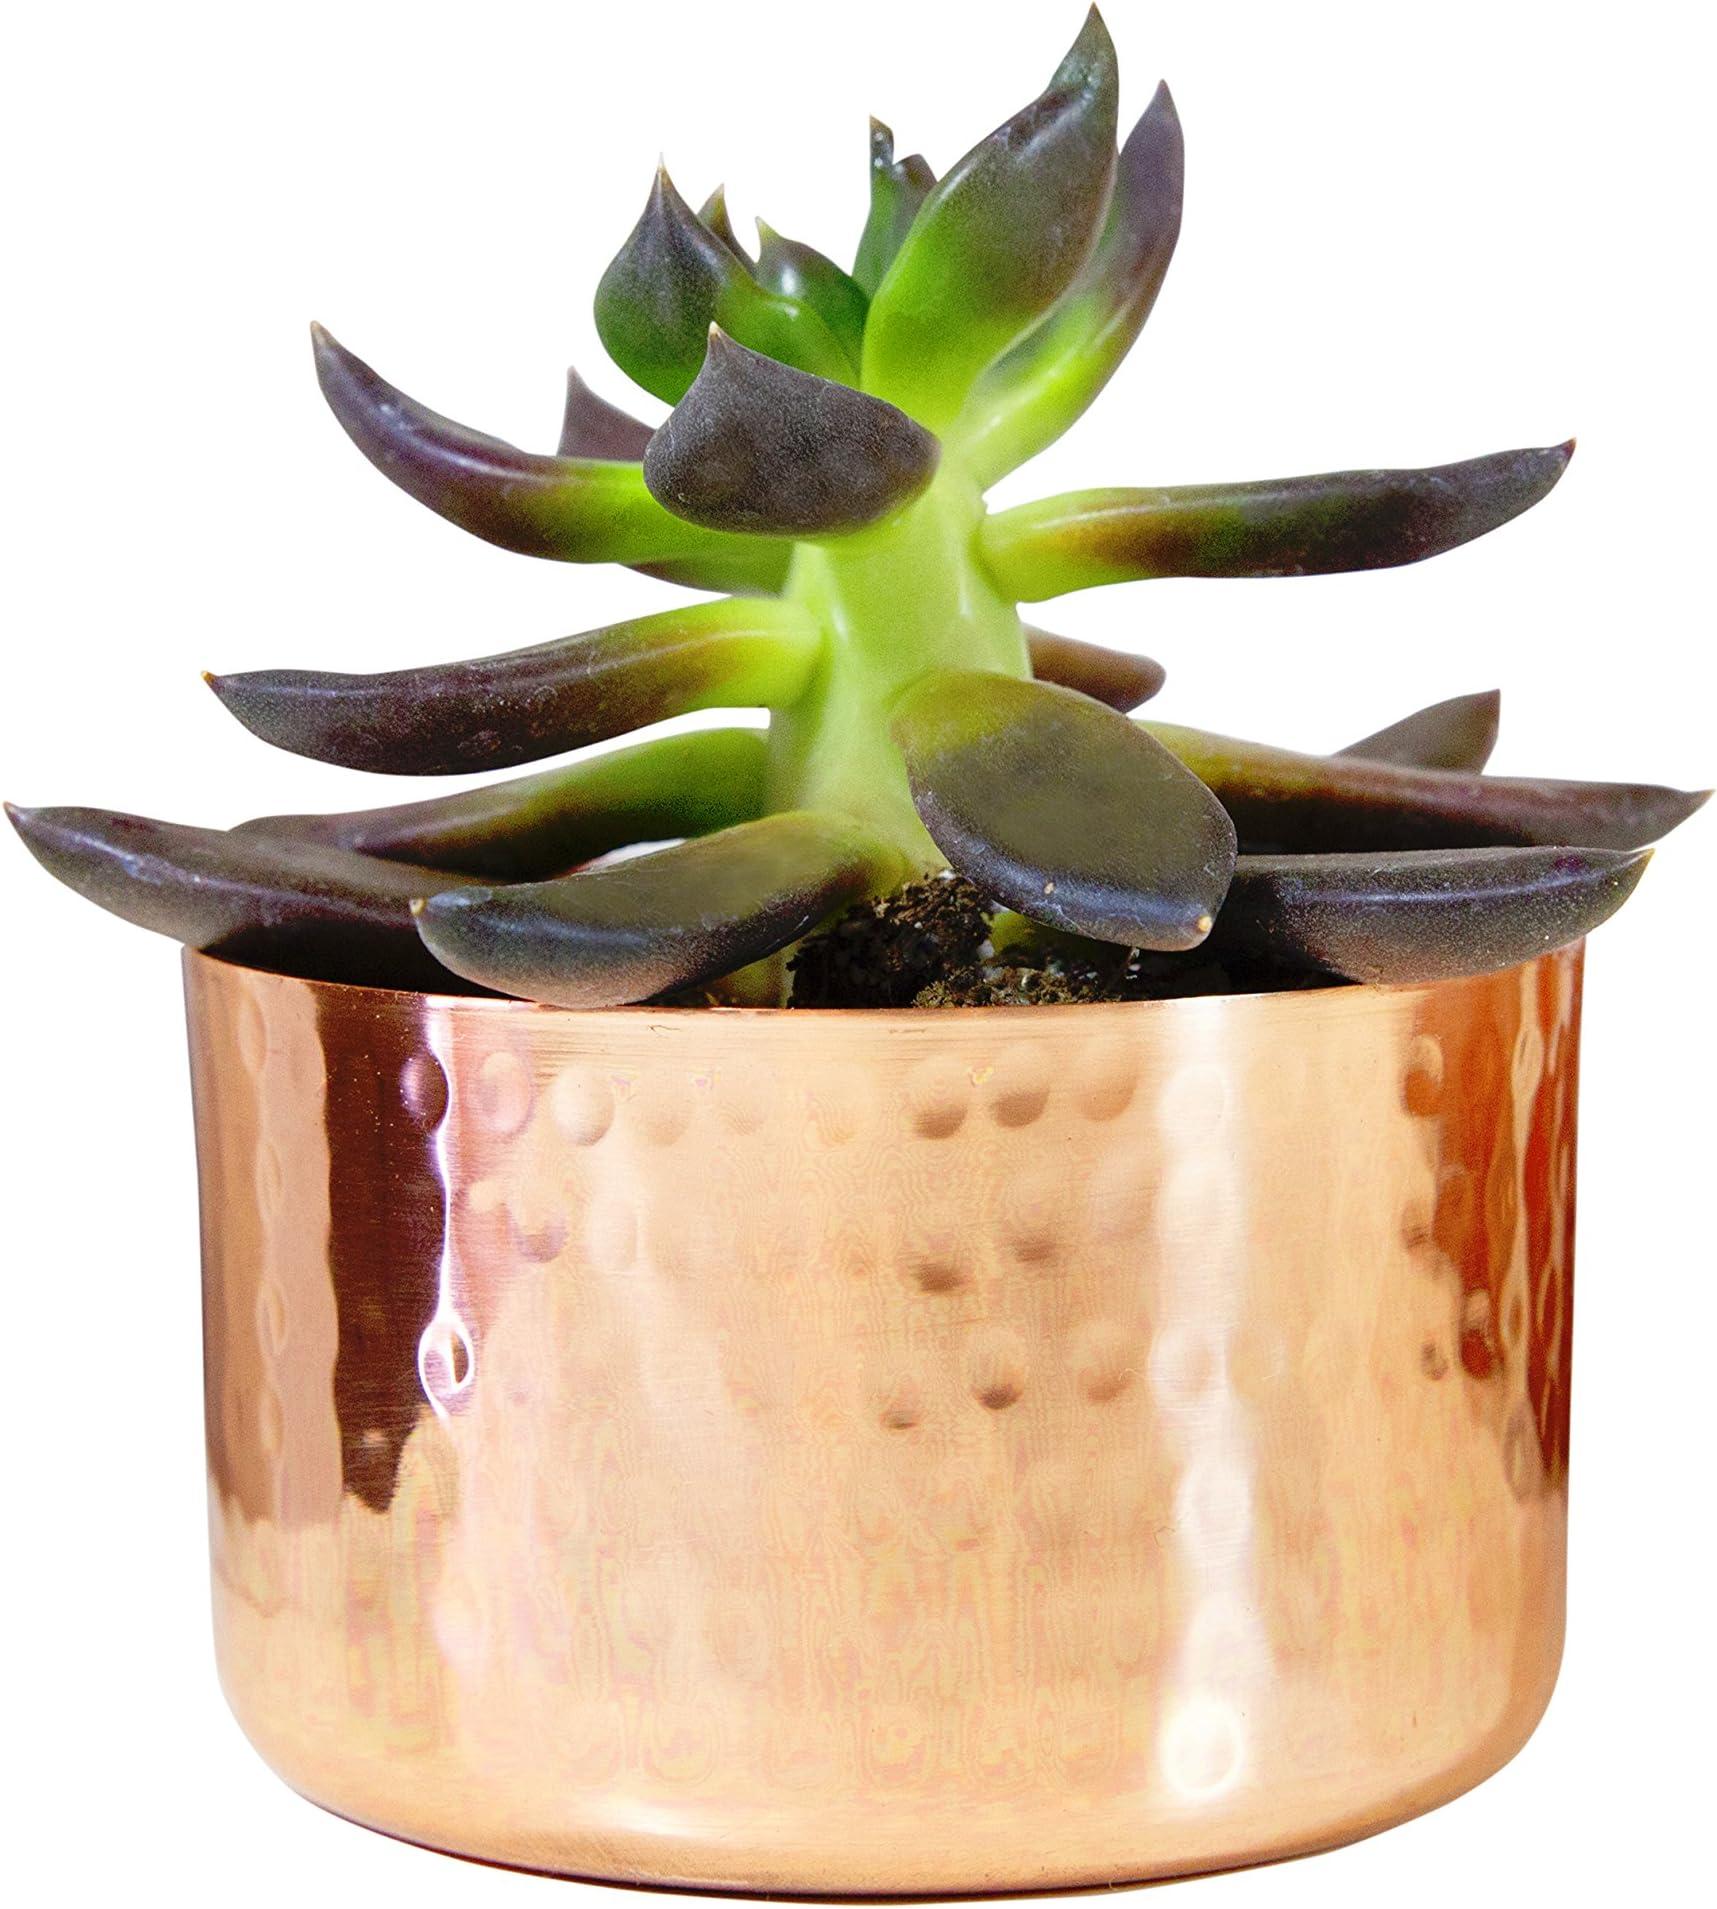 "Alchemade 3"" Hammered Copper Succulent Planter Plants"